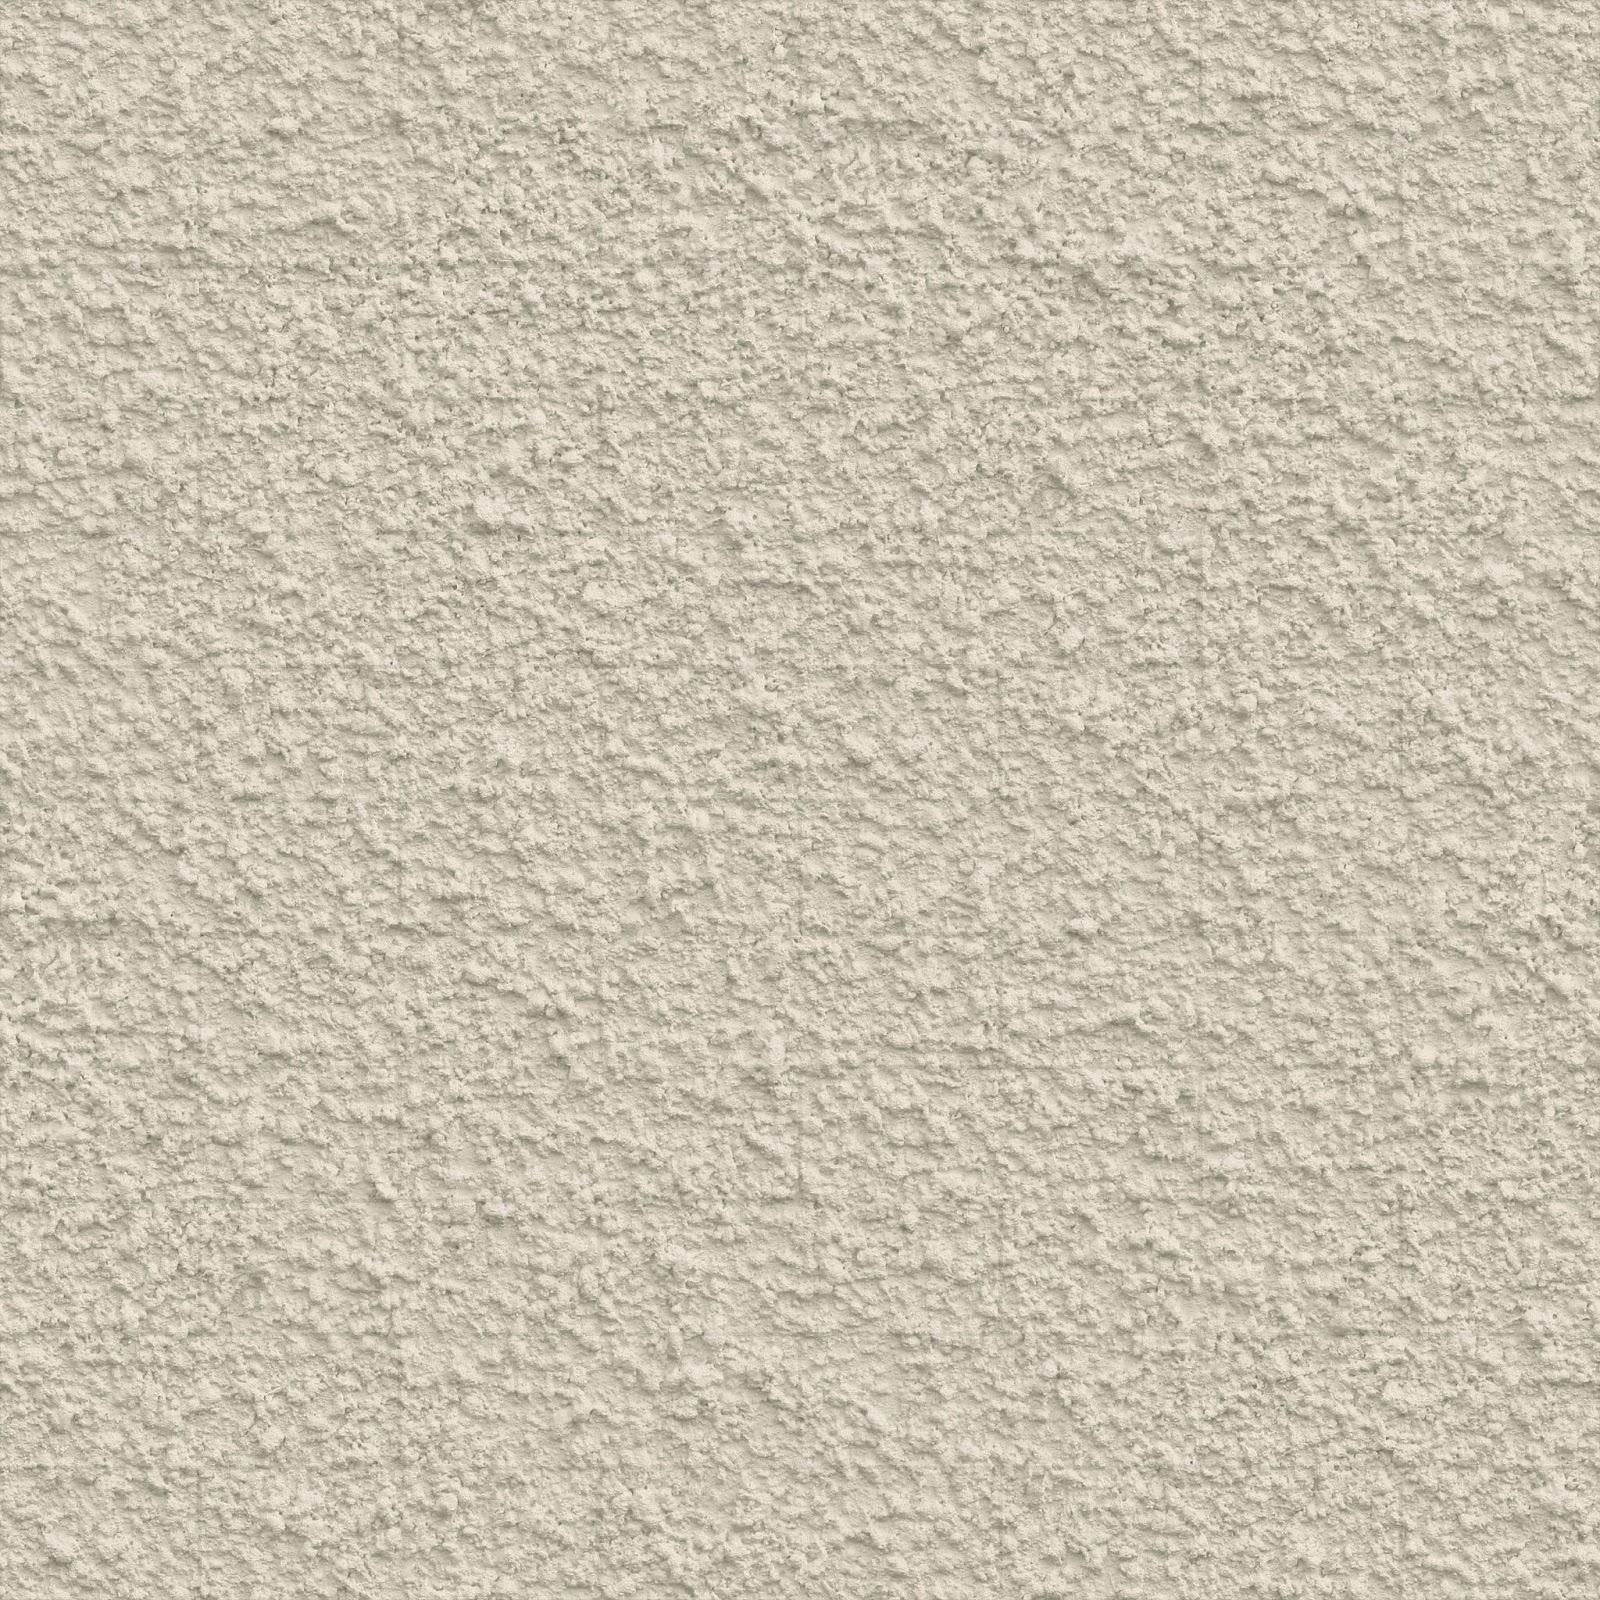 Wall paint texture seamless - High Resolution Seamless Textures Free Seamless Stucco Wall